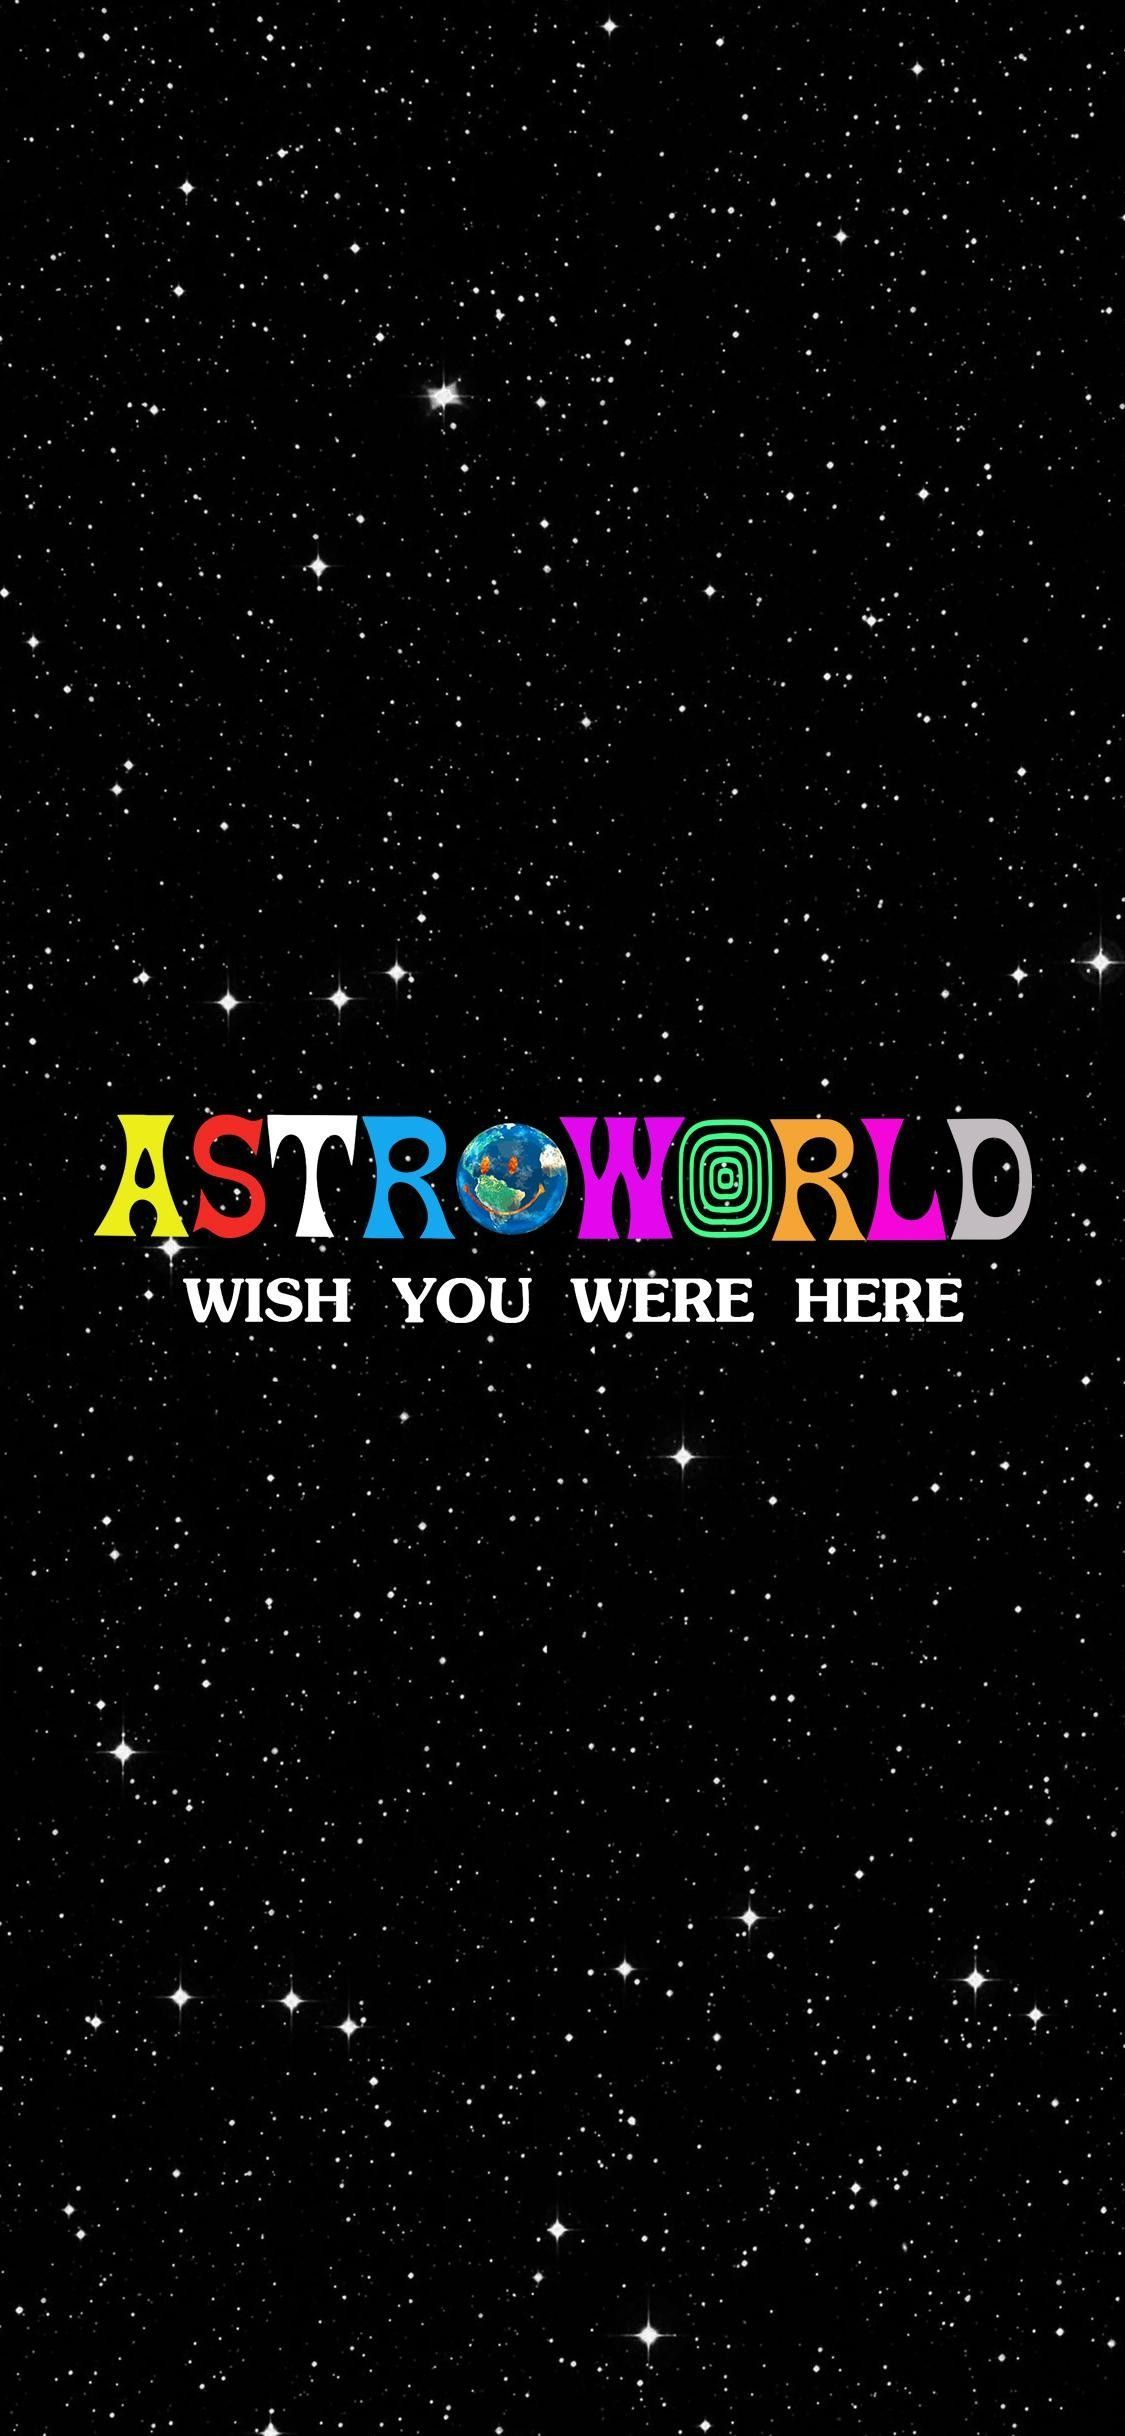 Astroworld Wallpaper Travisscottwallpapers Painting Wallpaper